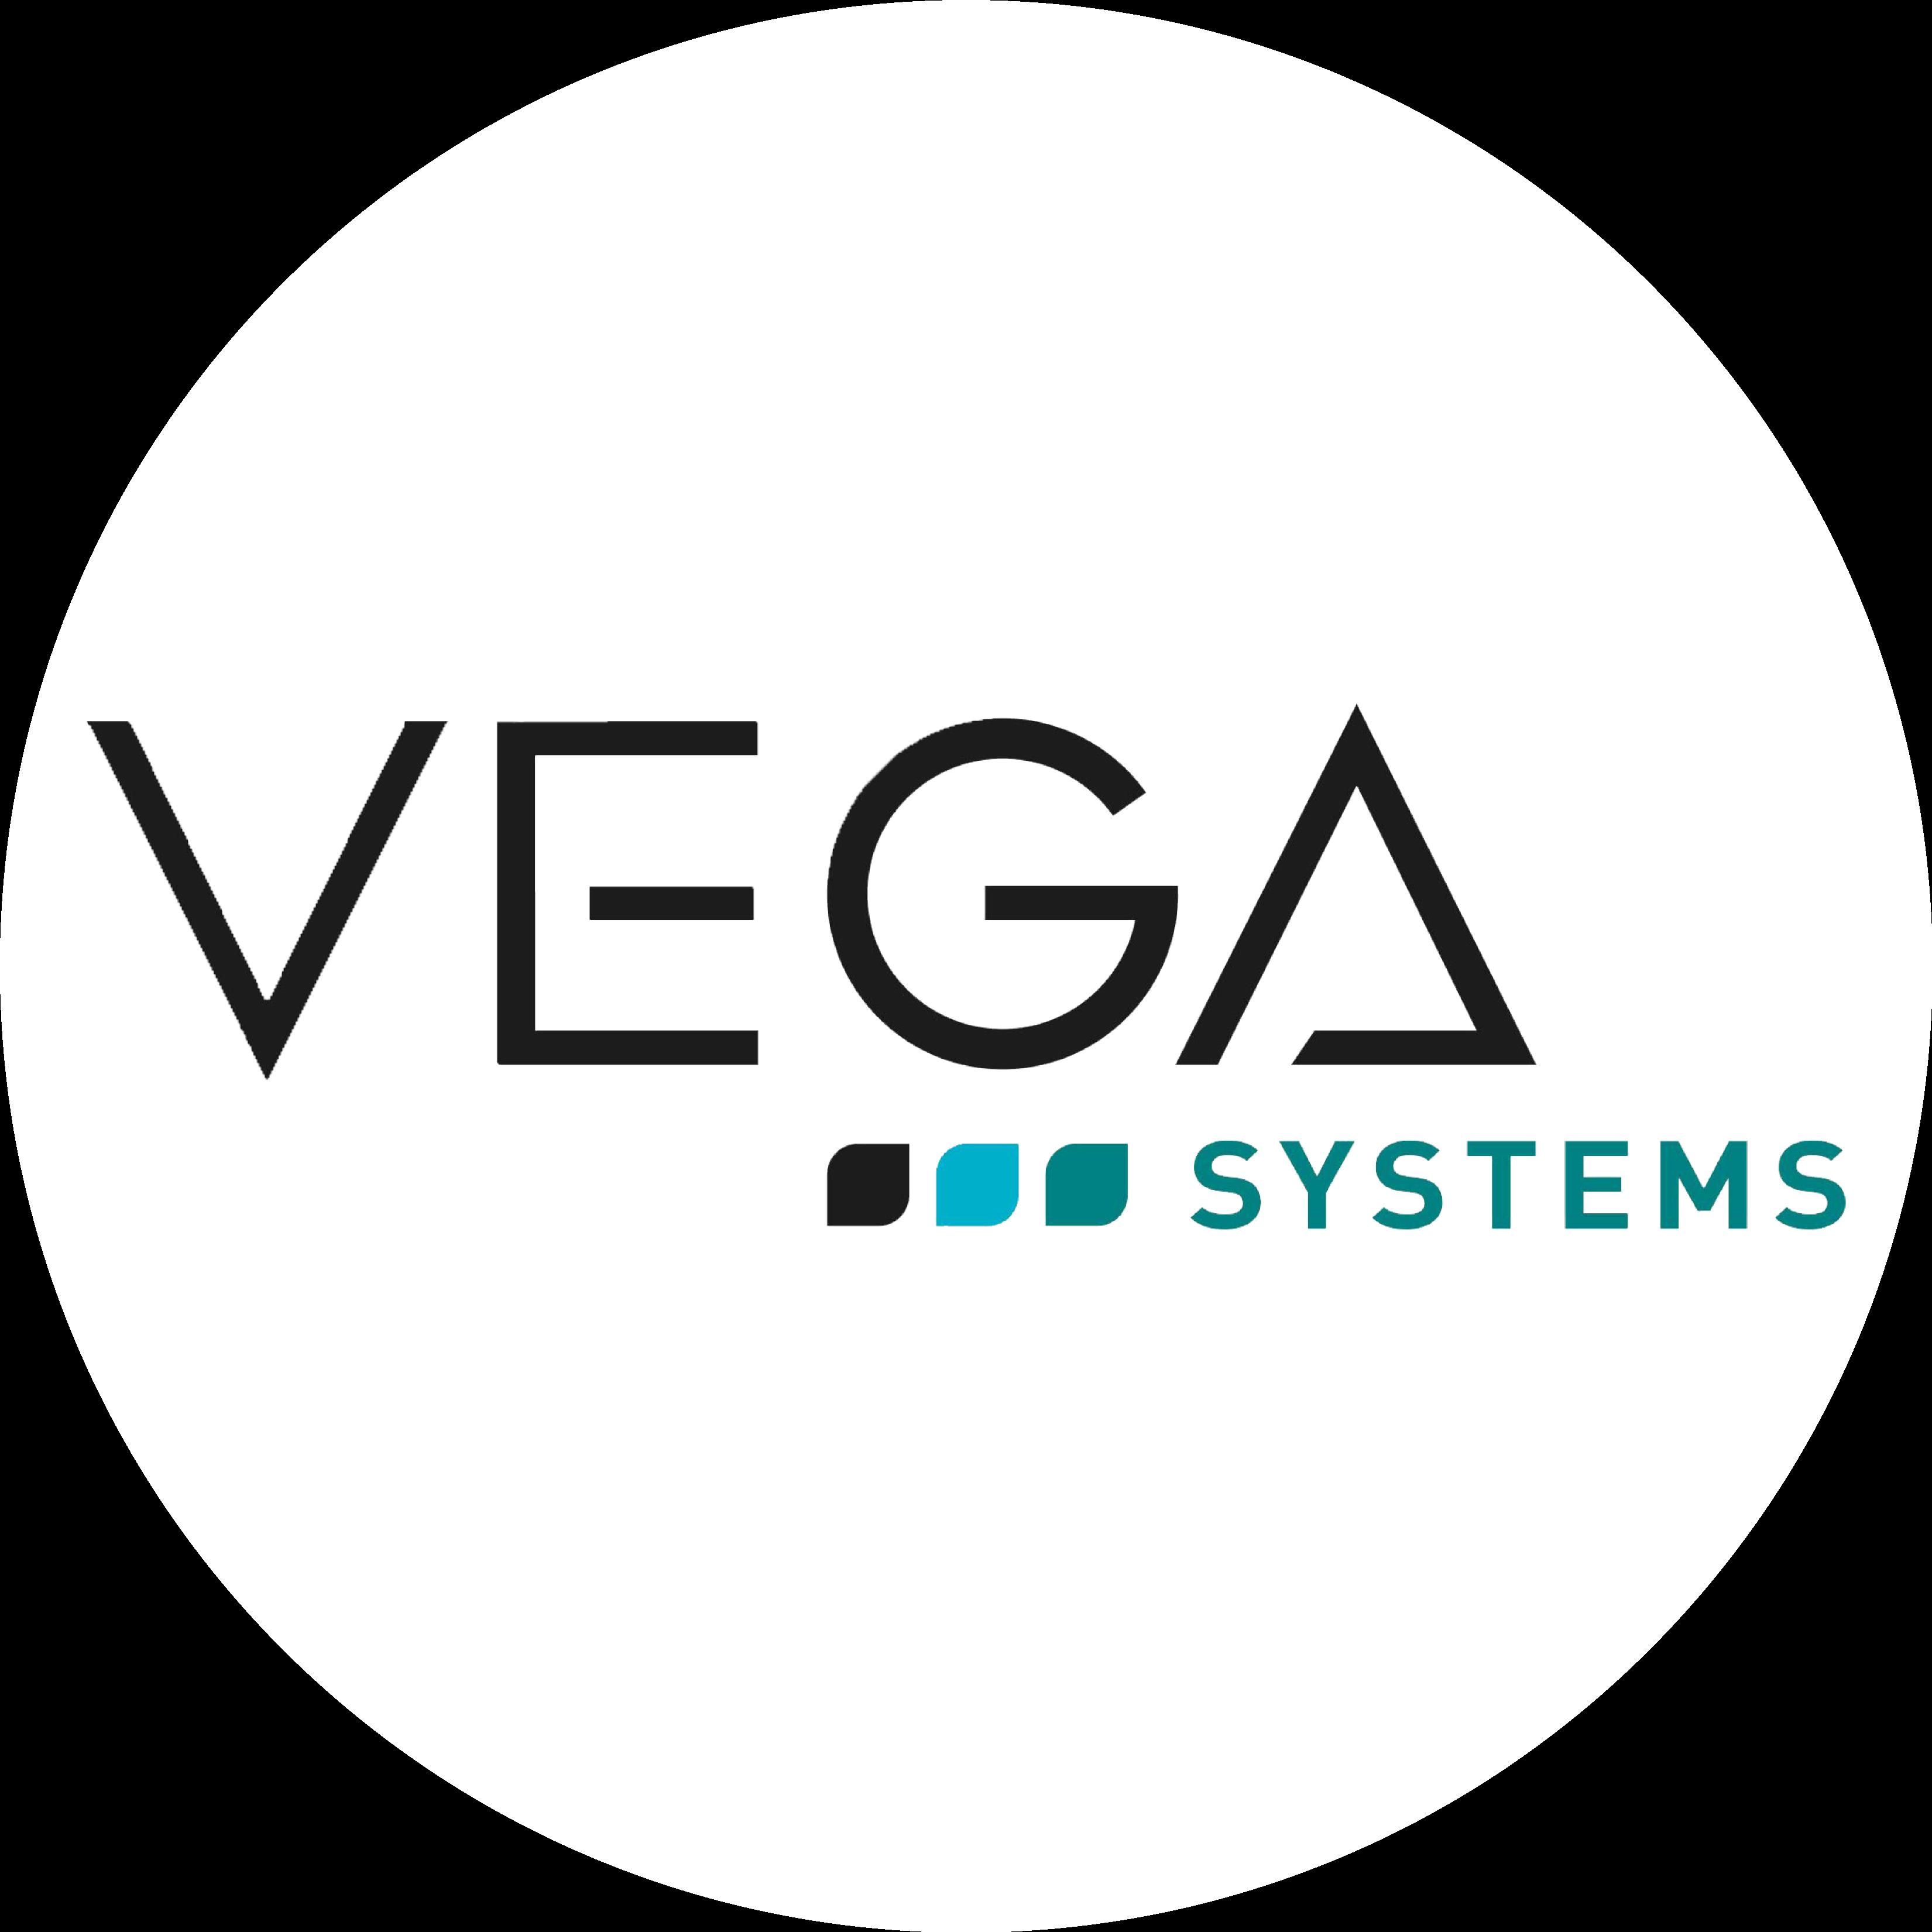 VEGA SYSTEMS